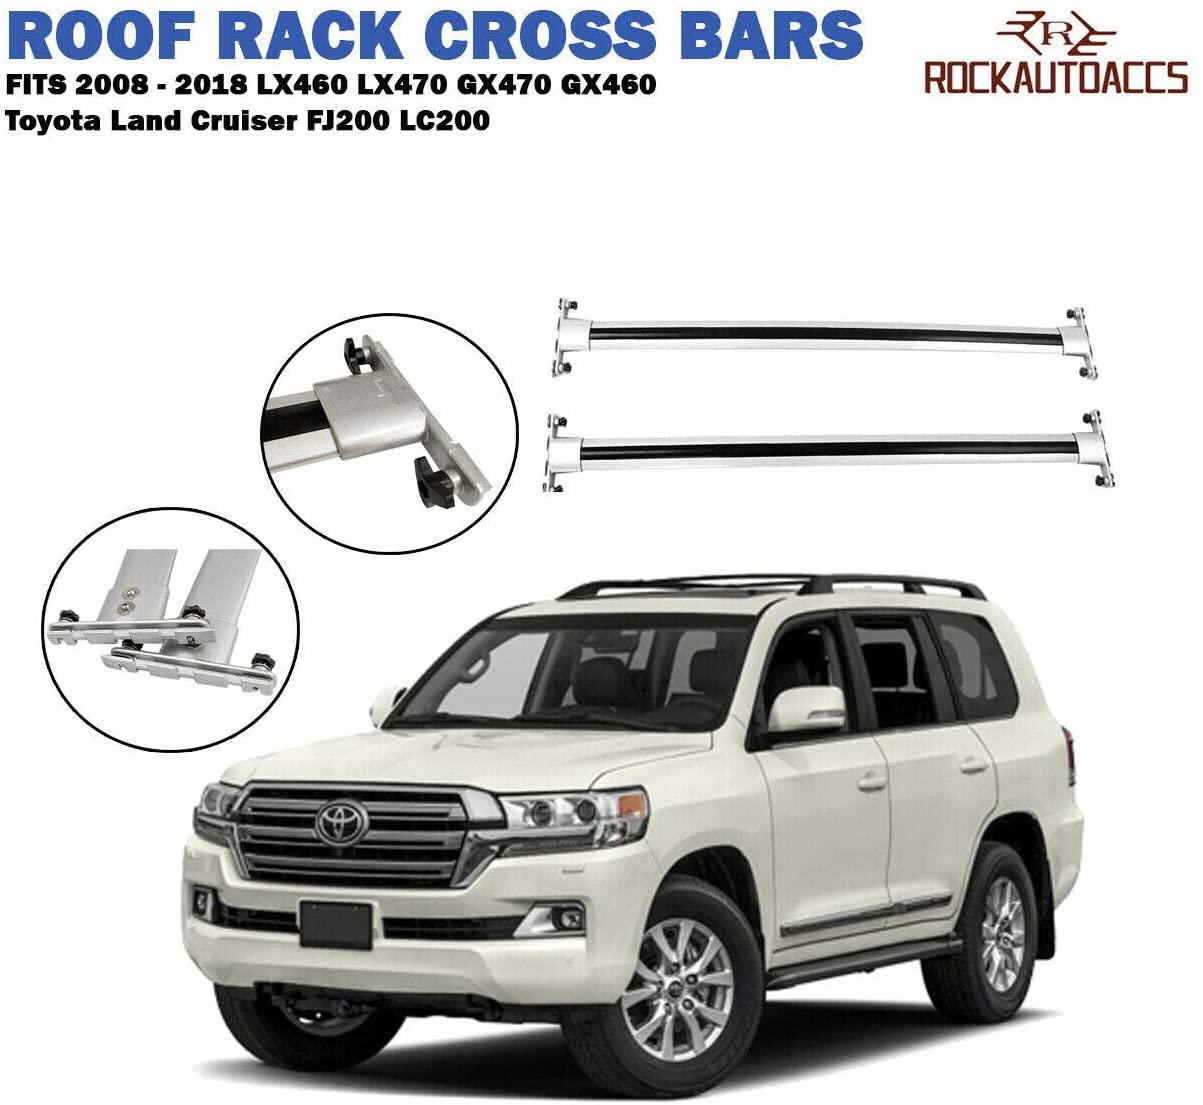 rokiotoex roof rack crossbars fit lx460 lx470 gx470 gx460 toyota land cruiser fj200 lc200 2008 2018 baggage luggage carrier roof rail cross bars